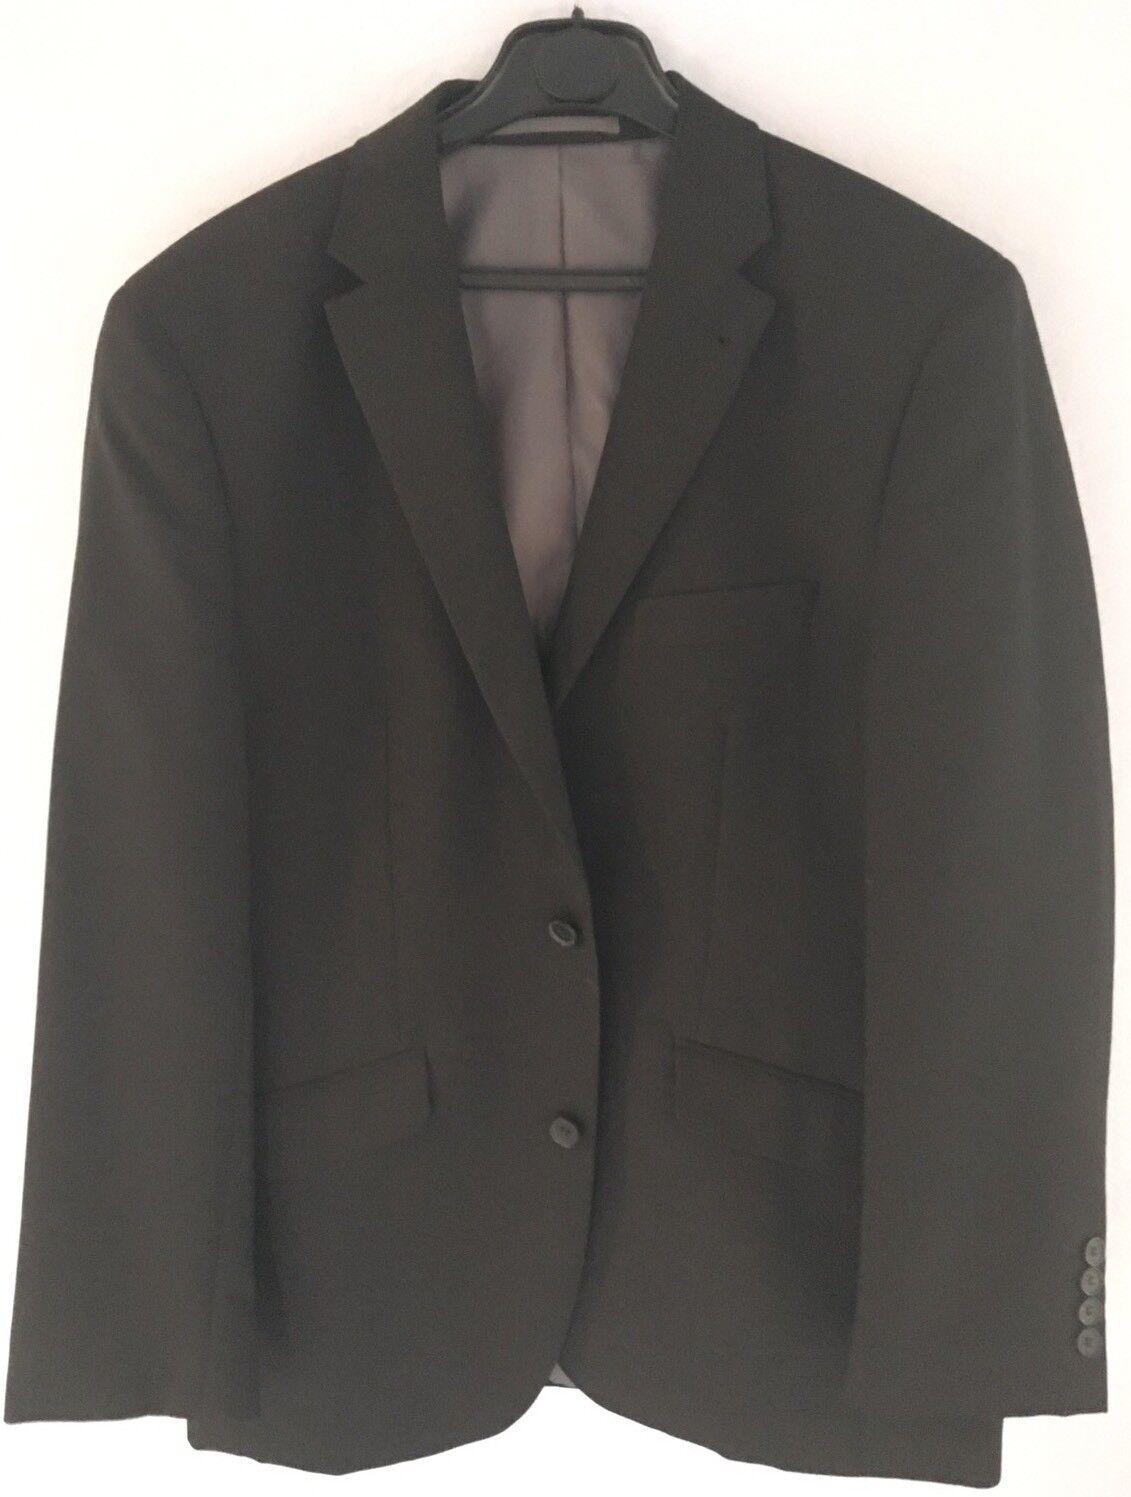 Beach Wear coton jupe Longueue Maxi Boho Hippie vêtements indiens BSK341CBSK341C